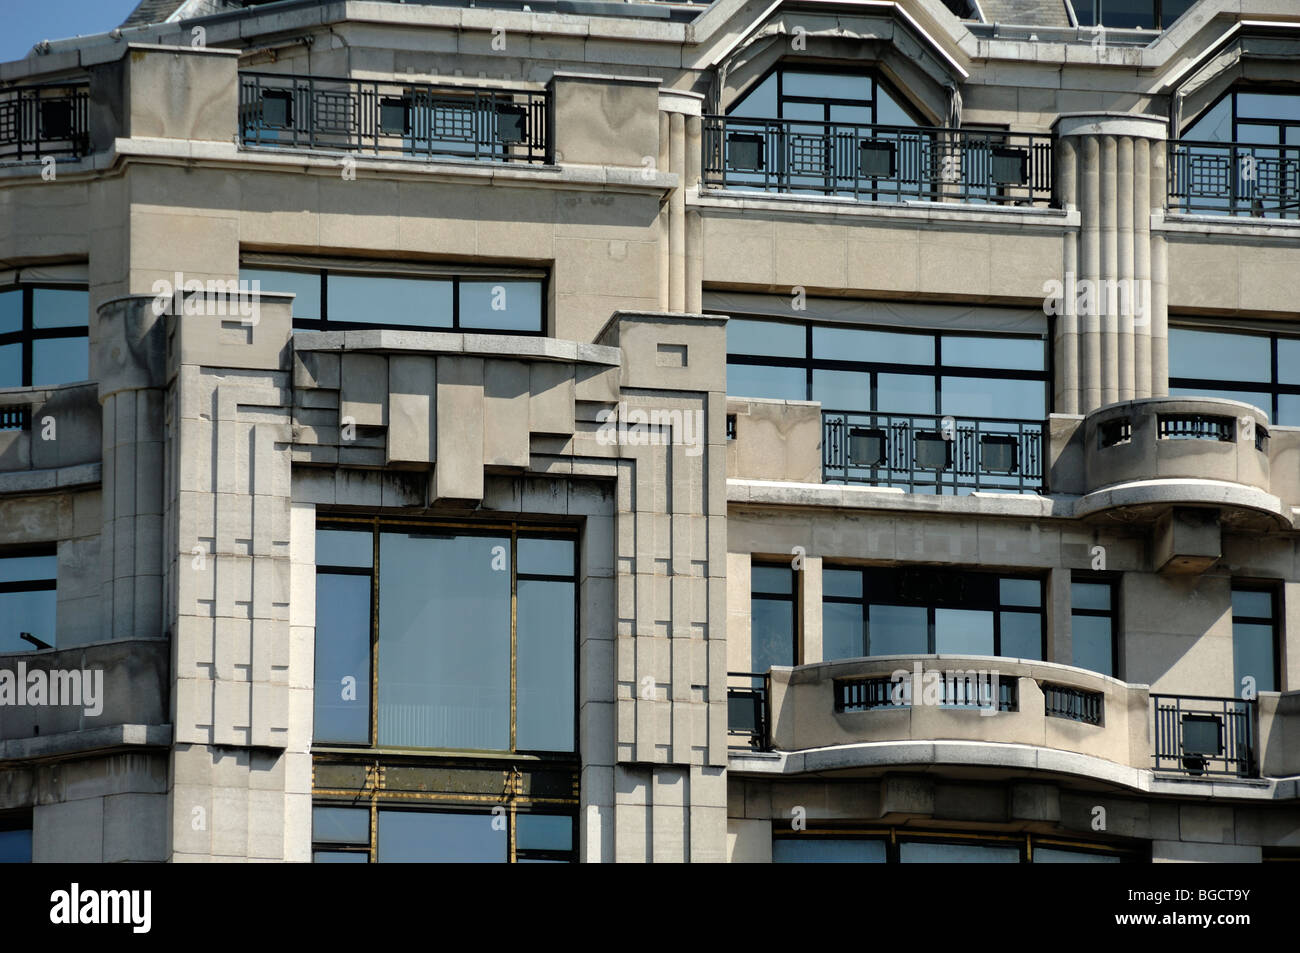 Cheap Art Deco Balconies U Facade Of The La Samaritaine Department Store  Paris France With Store Deco